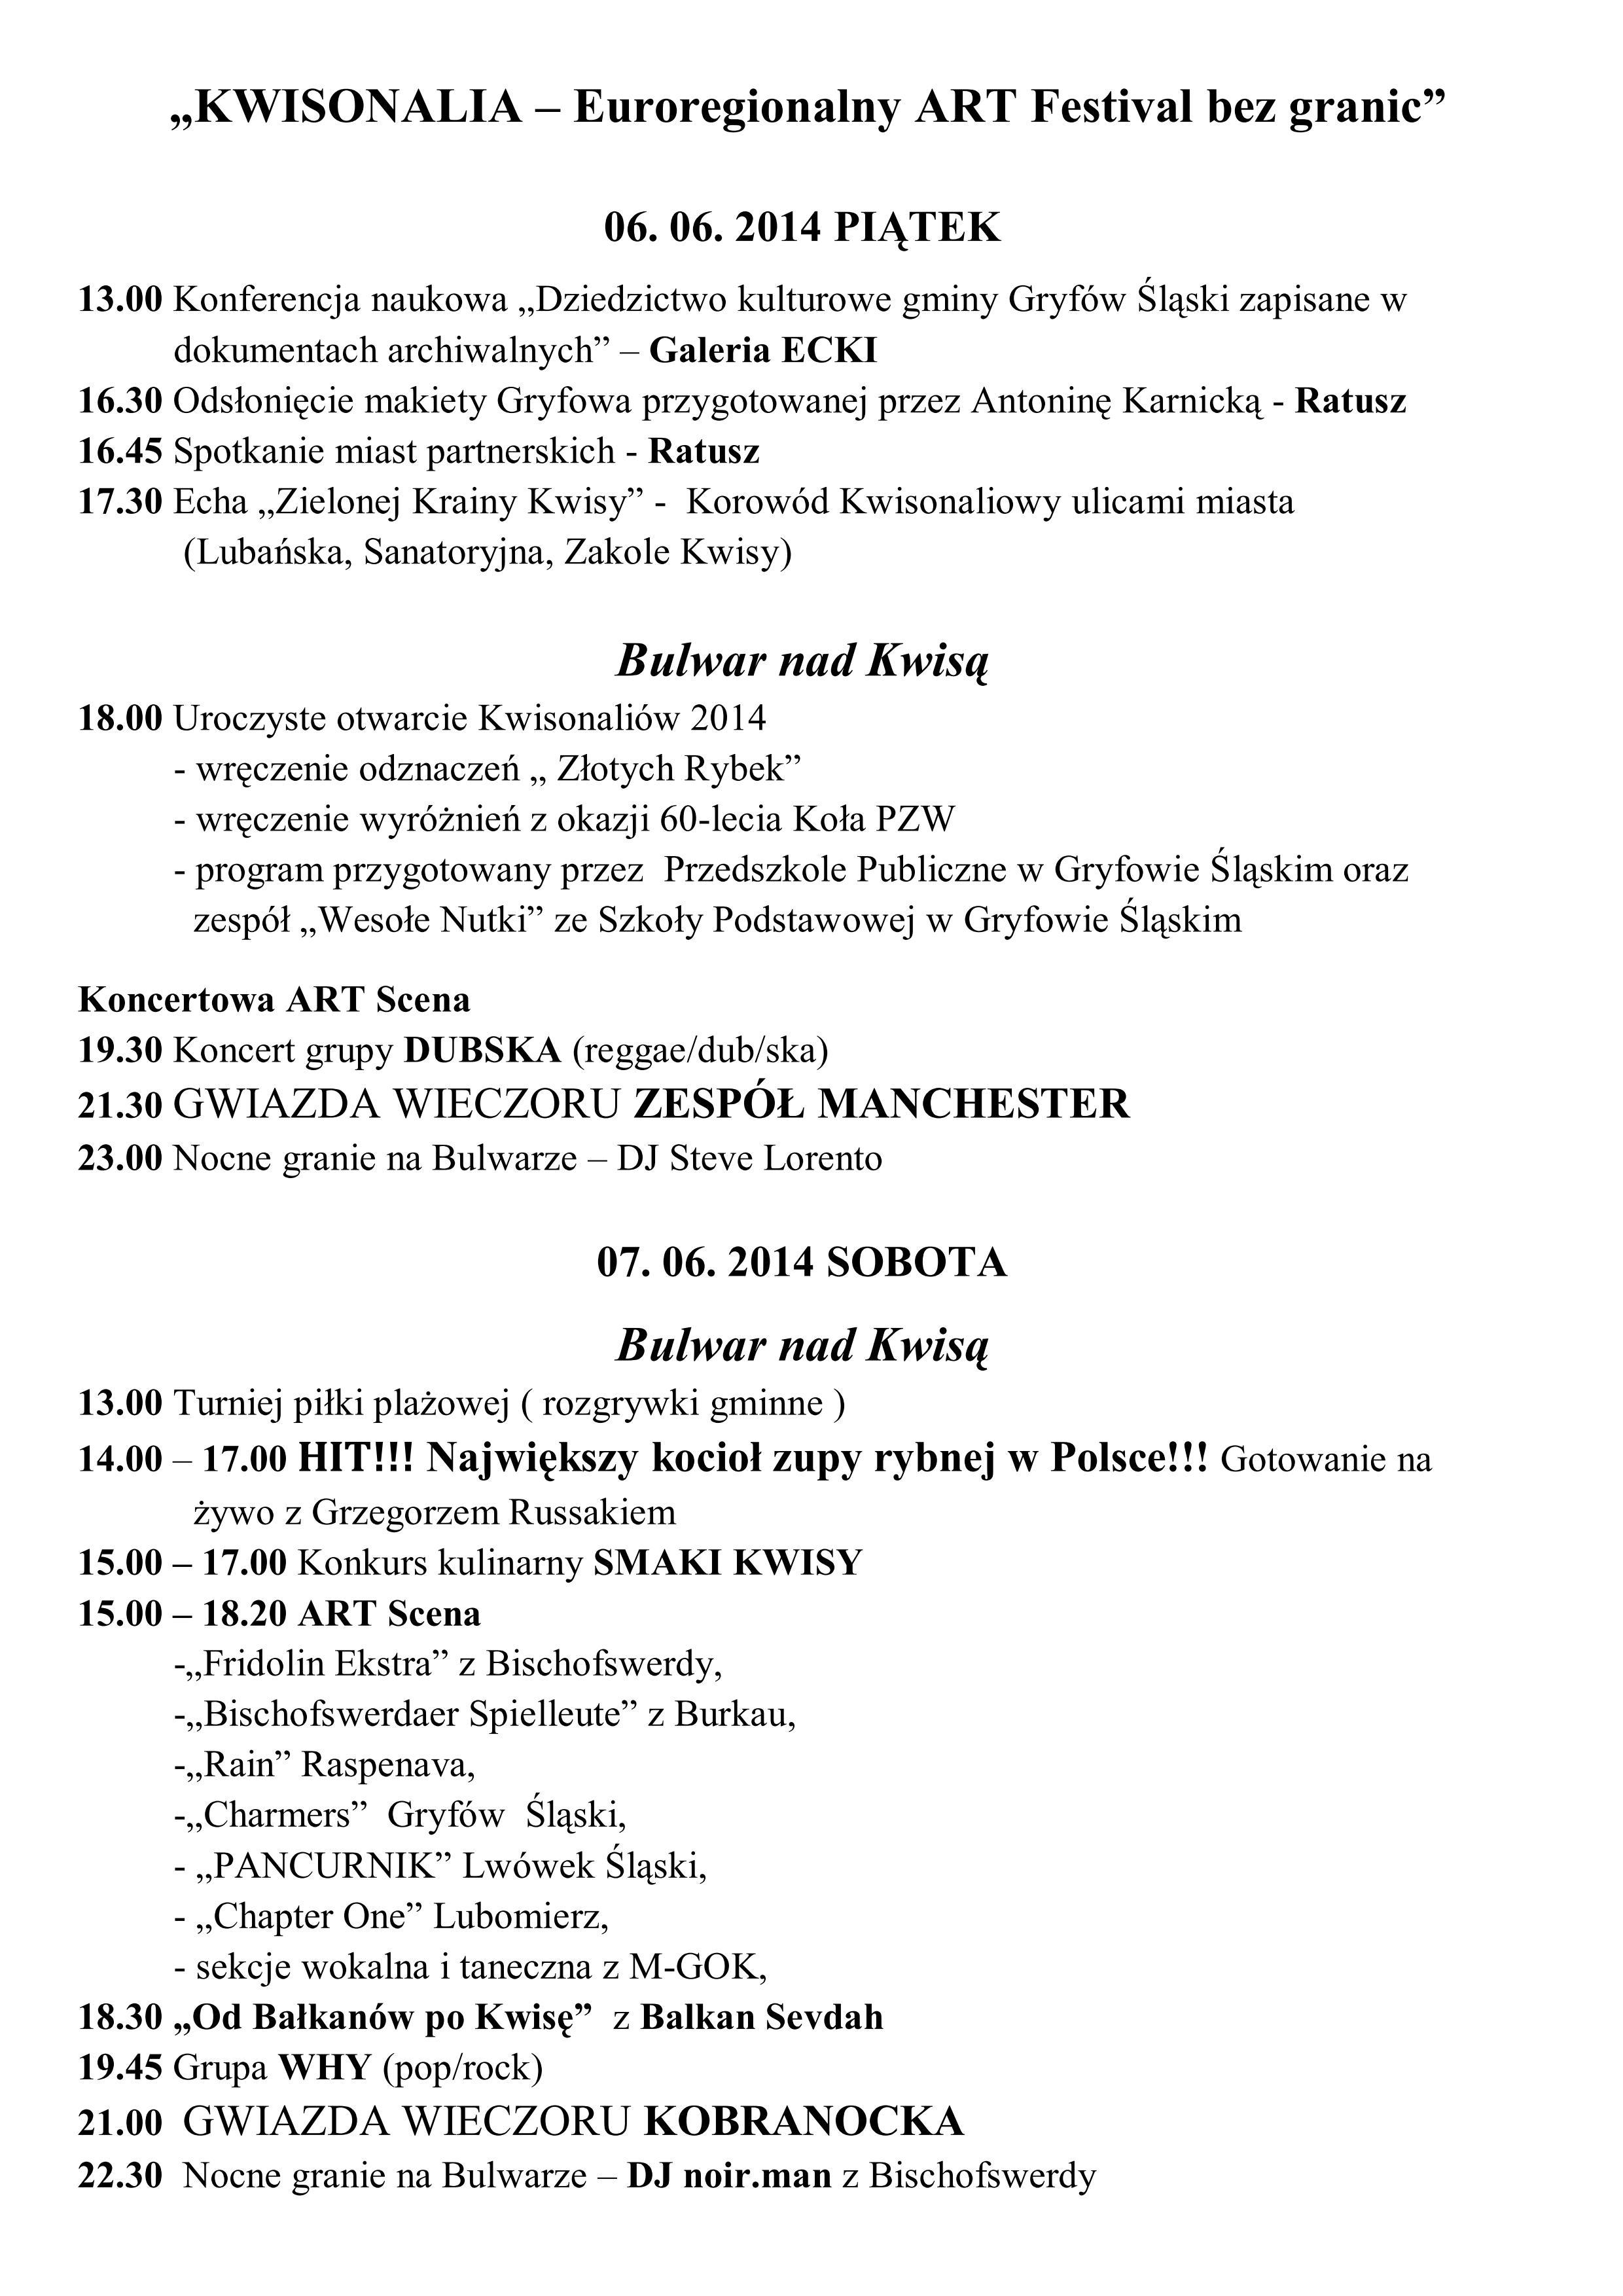 KWISONALIA 2014 program aktualny na 16 MAJA_03